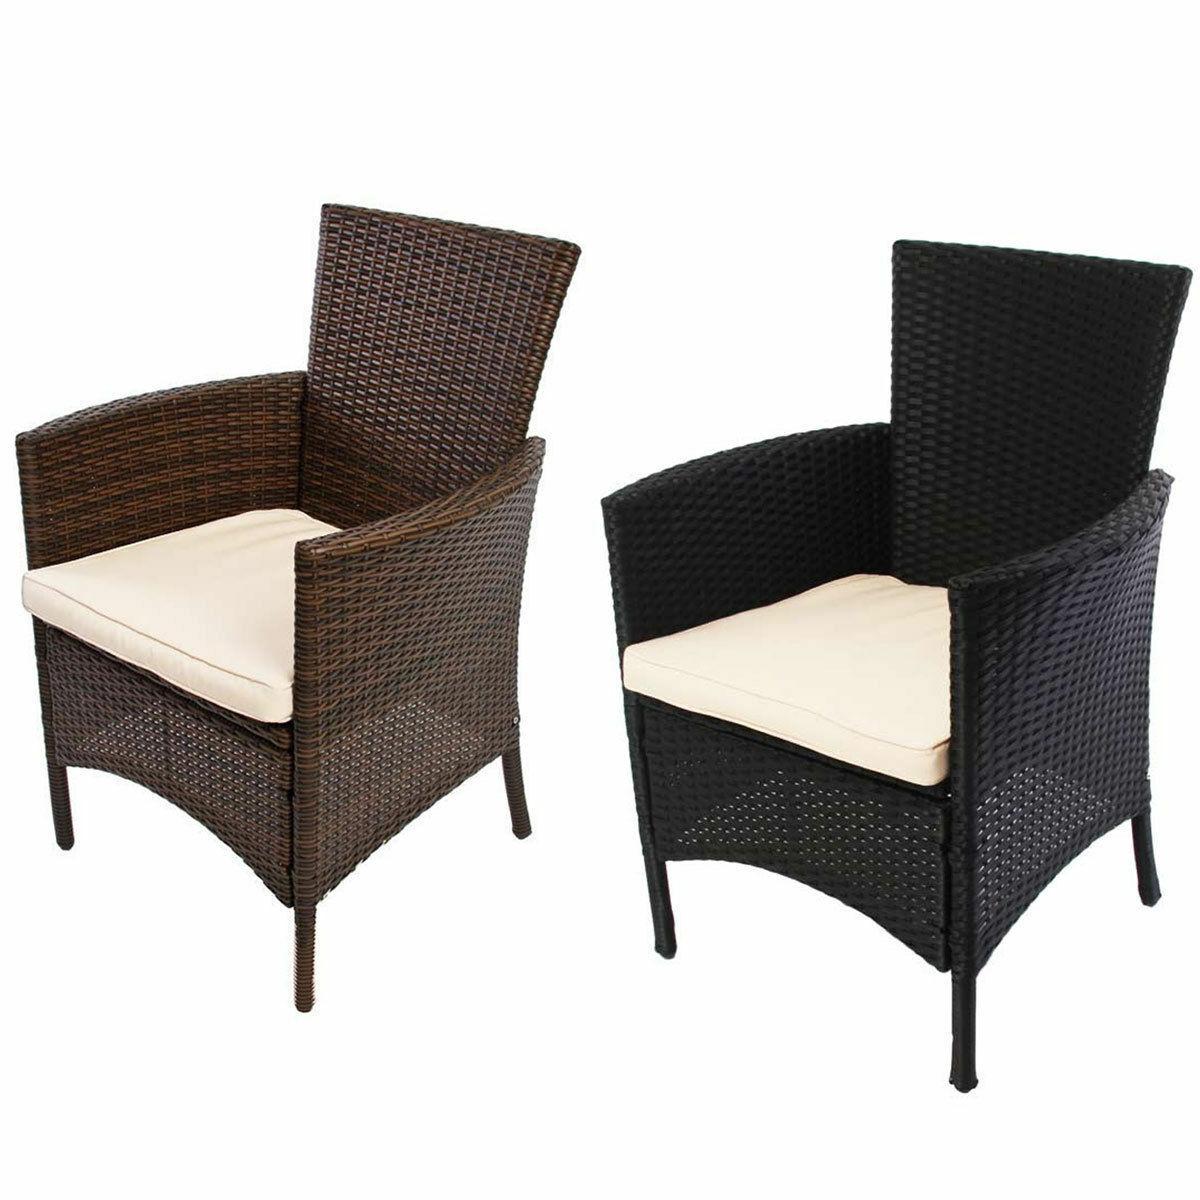 1x o 2x jardín butaca cesta sillón romv Poly-ratán Alu antracita marrón-moteado